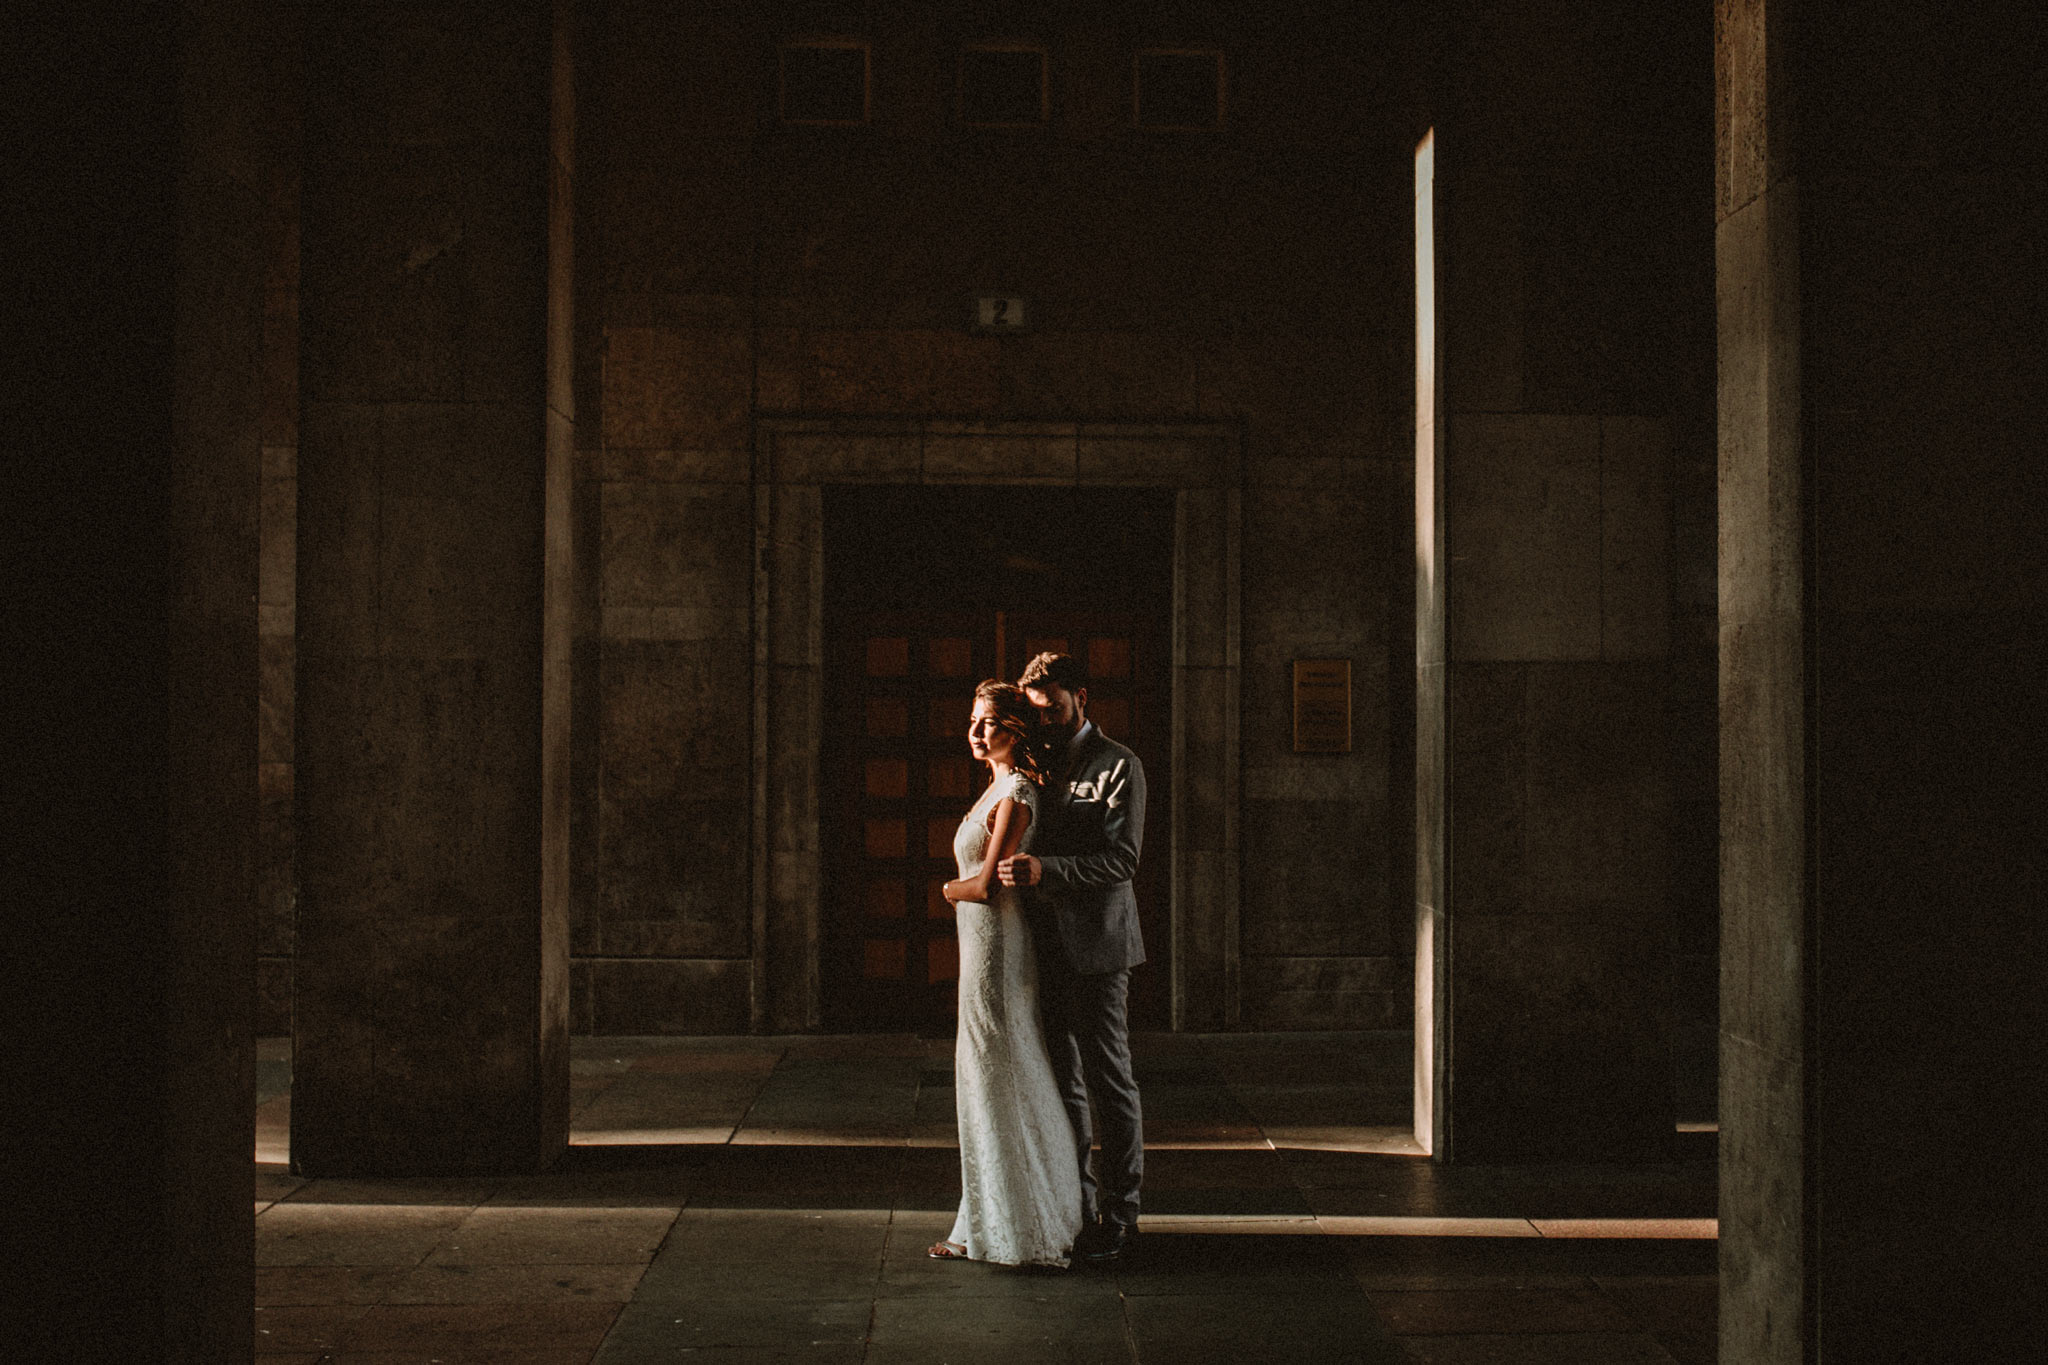 Hochzeit_in_Berlin_Fabrik23_